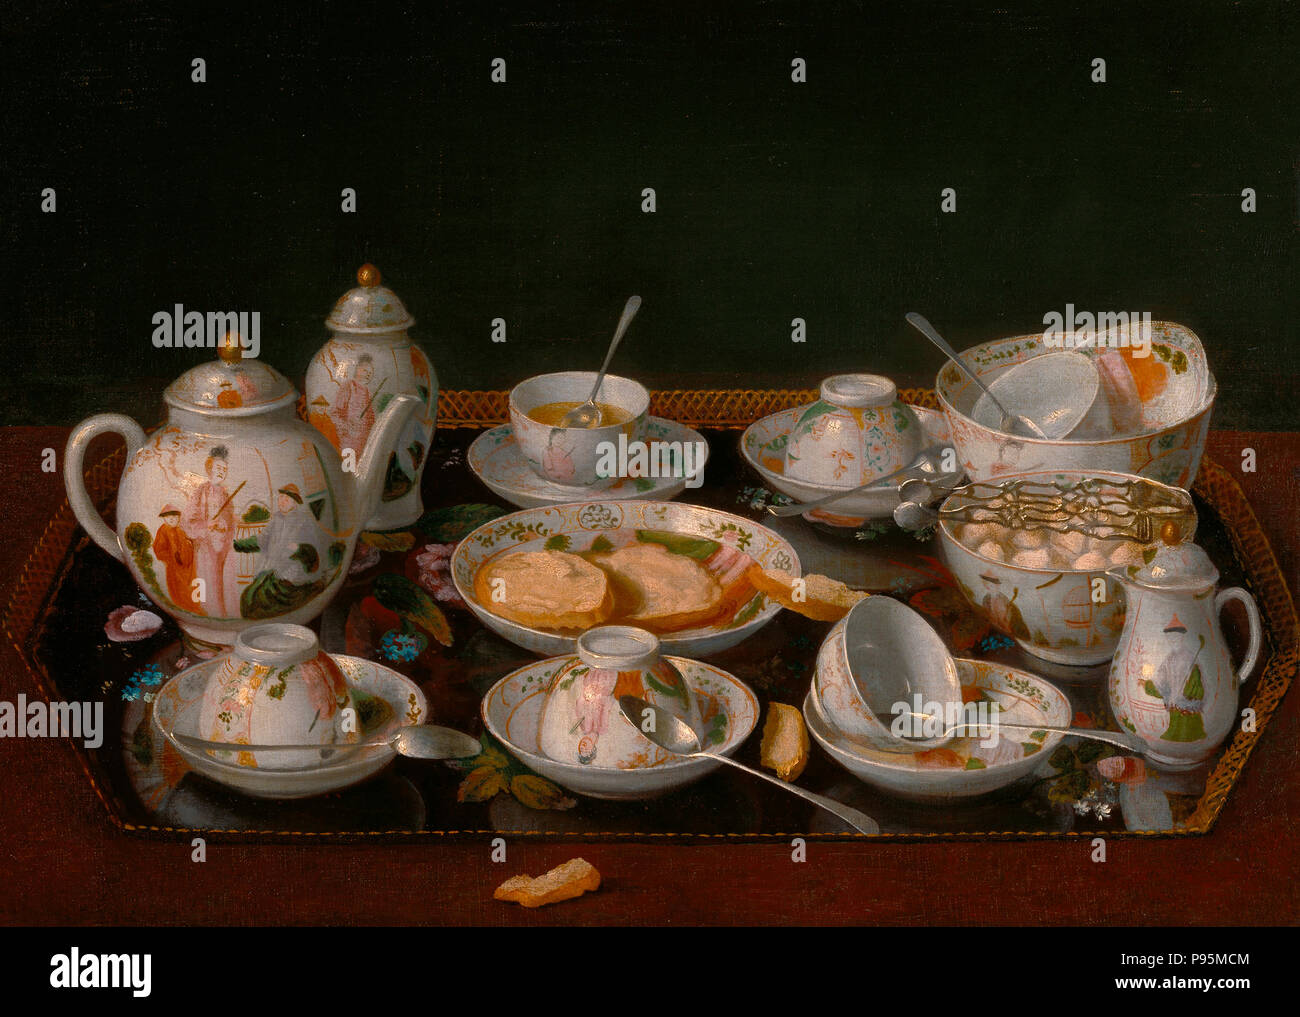 Still Life: juego de té - Jean- Etienne Liotard, circa 1782 Imagen De Stock